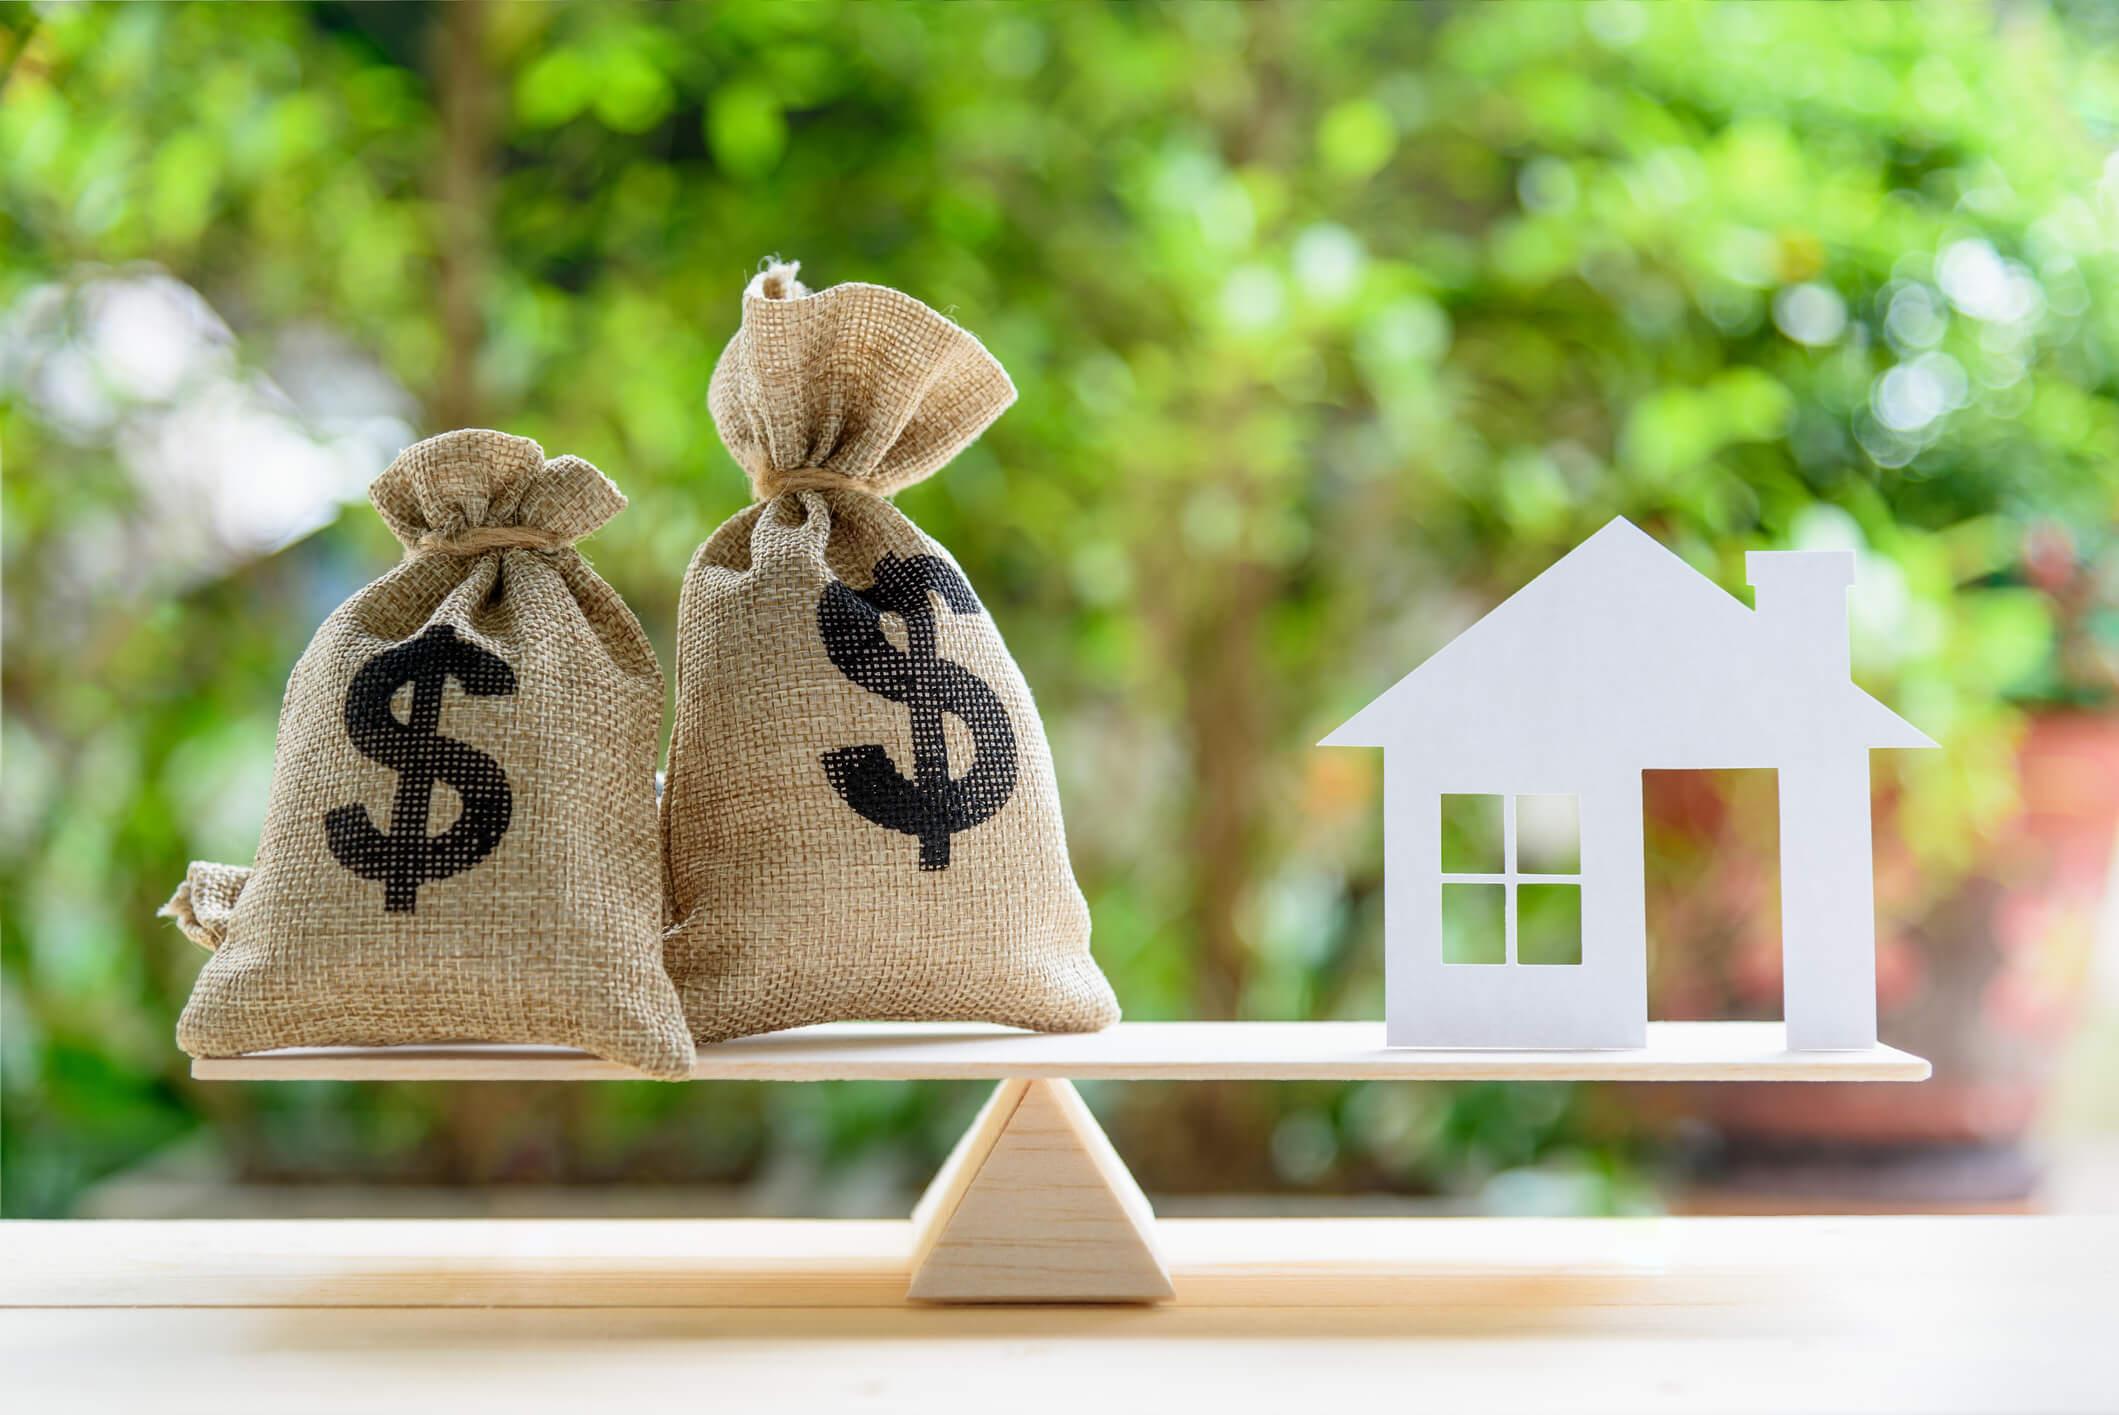 Balancing Home Money